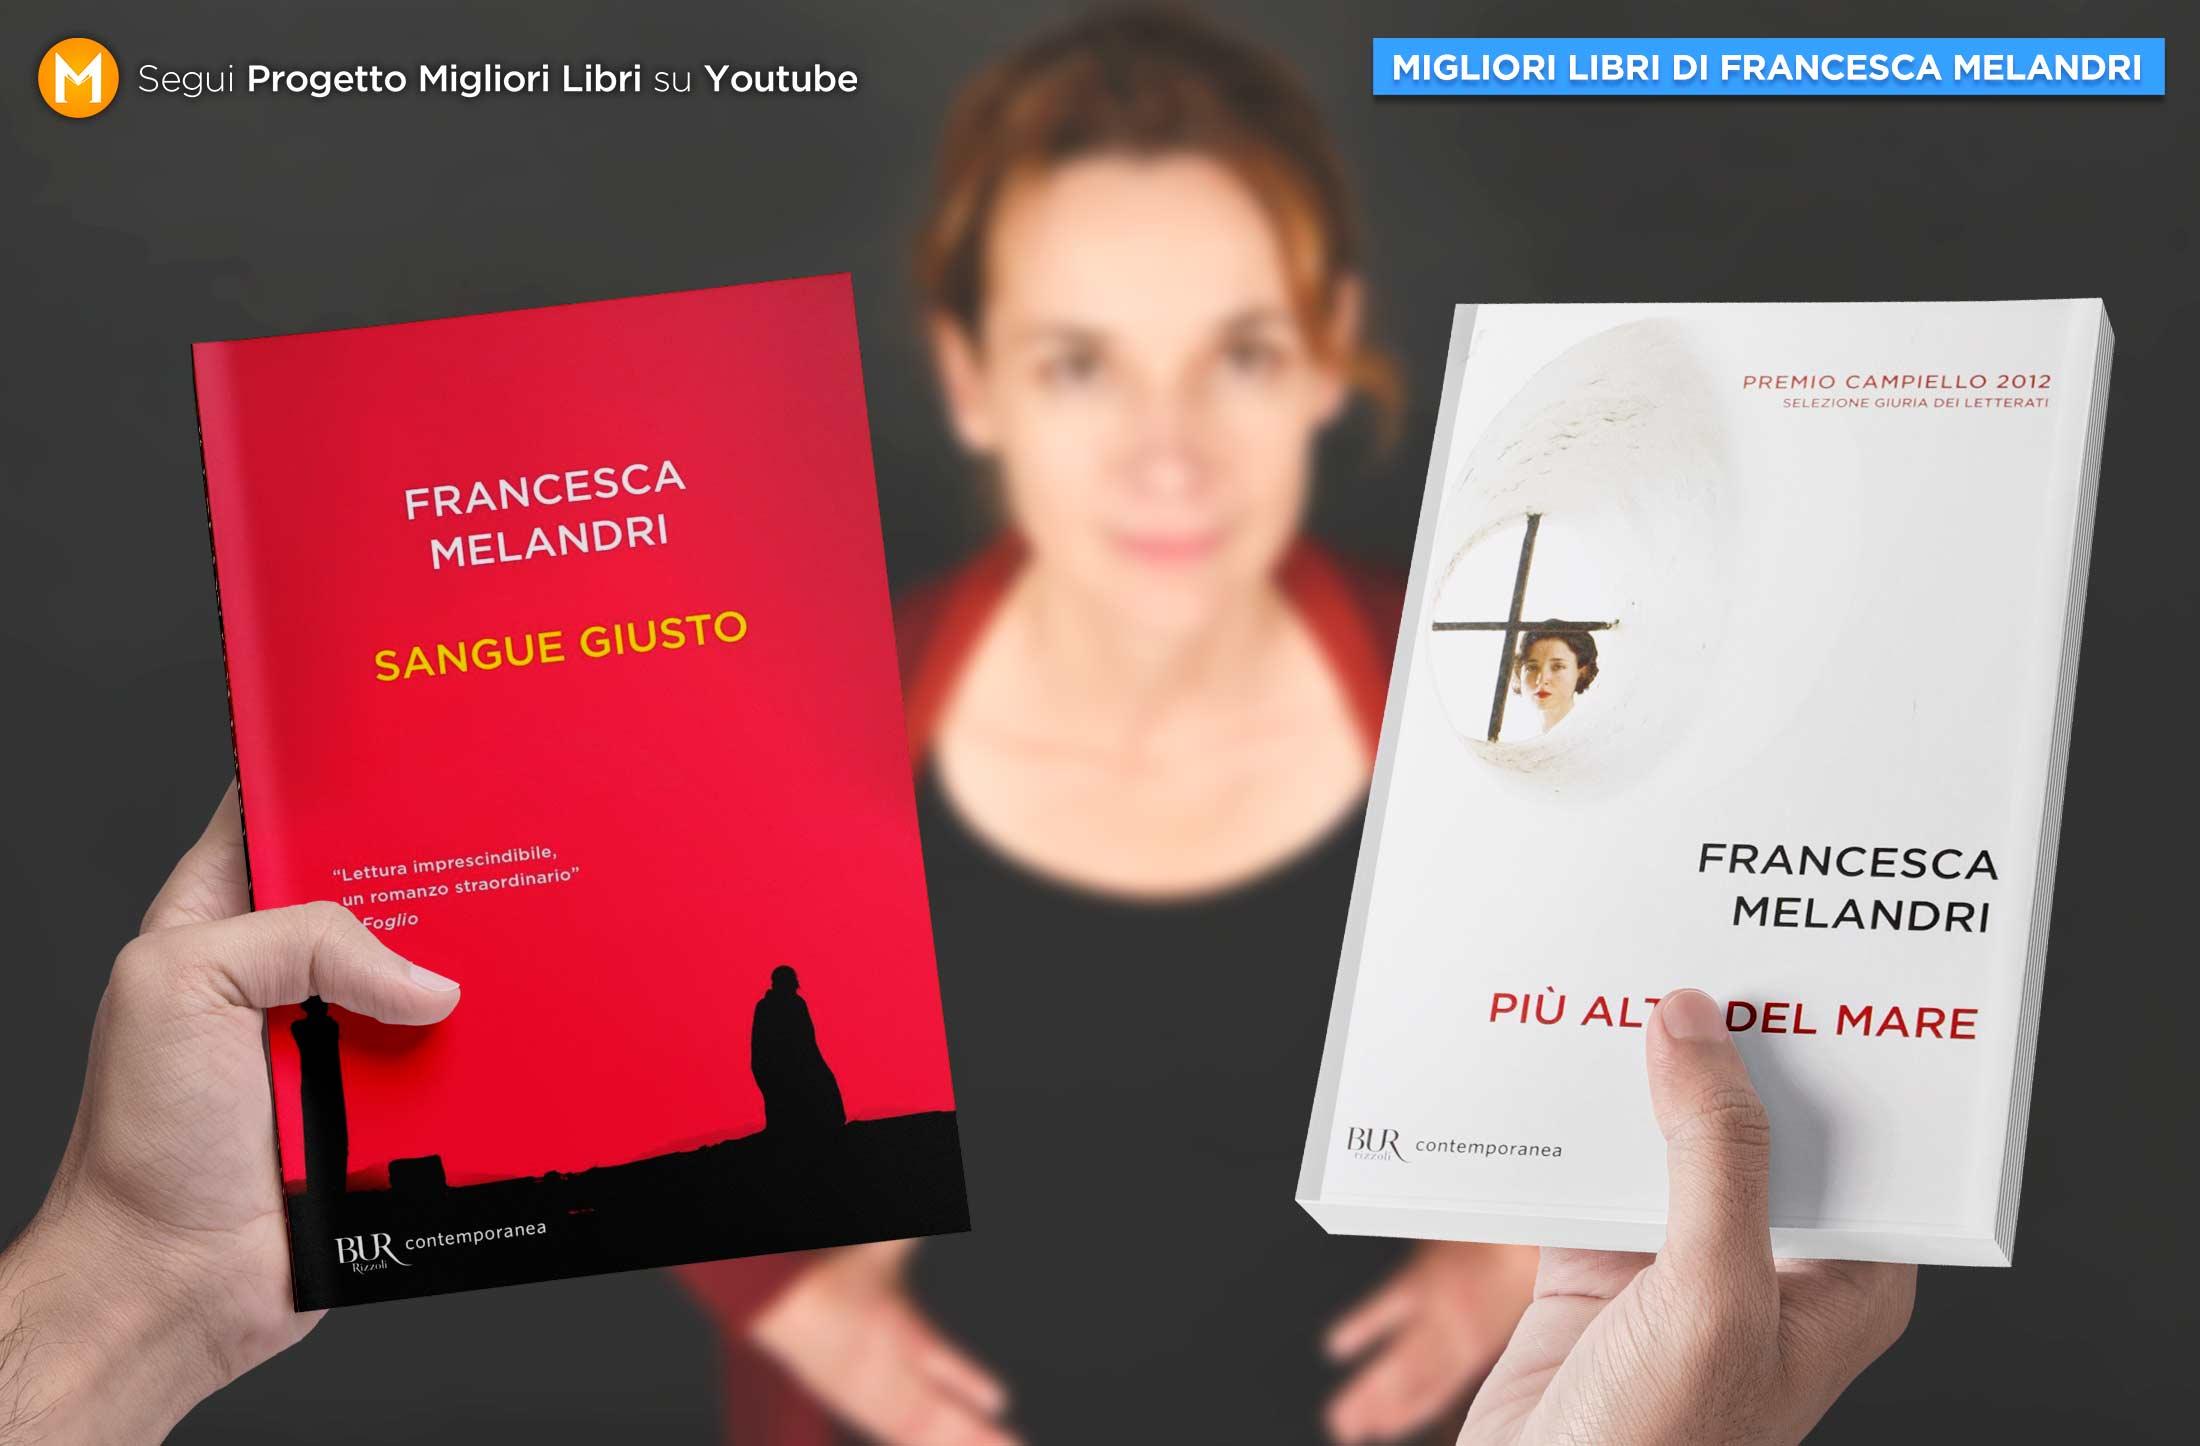 migliori-libri-francesca-melandri